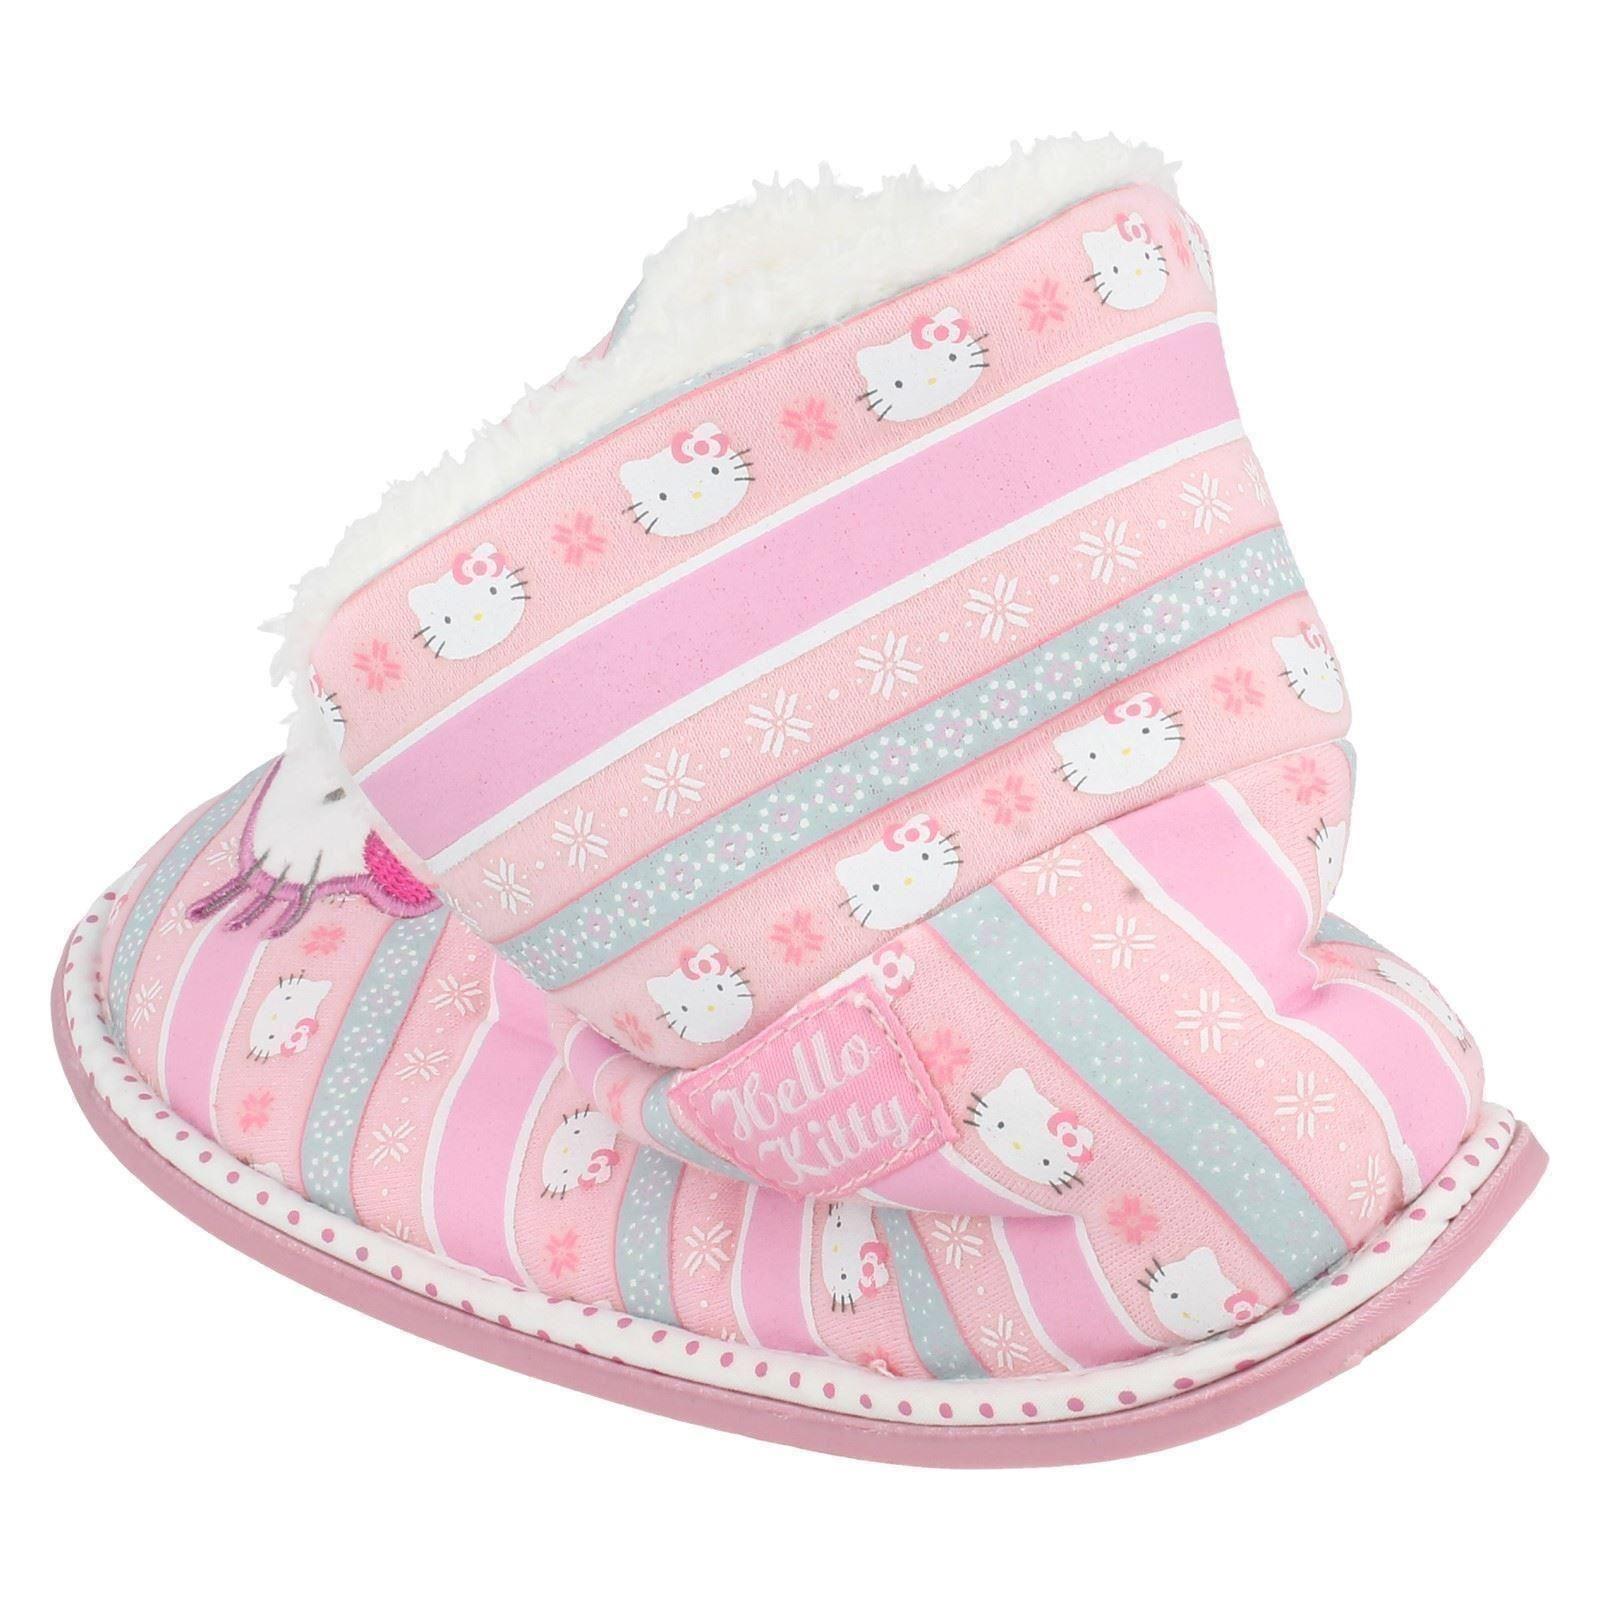 Niñas Hello Kitty Zapatillas Botas Estilo - 320 / 3193